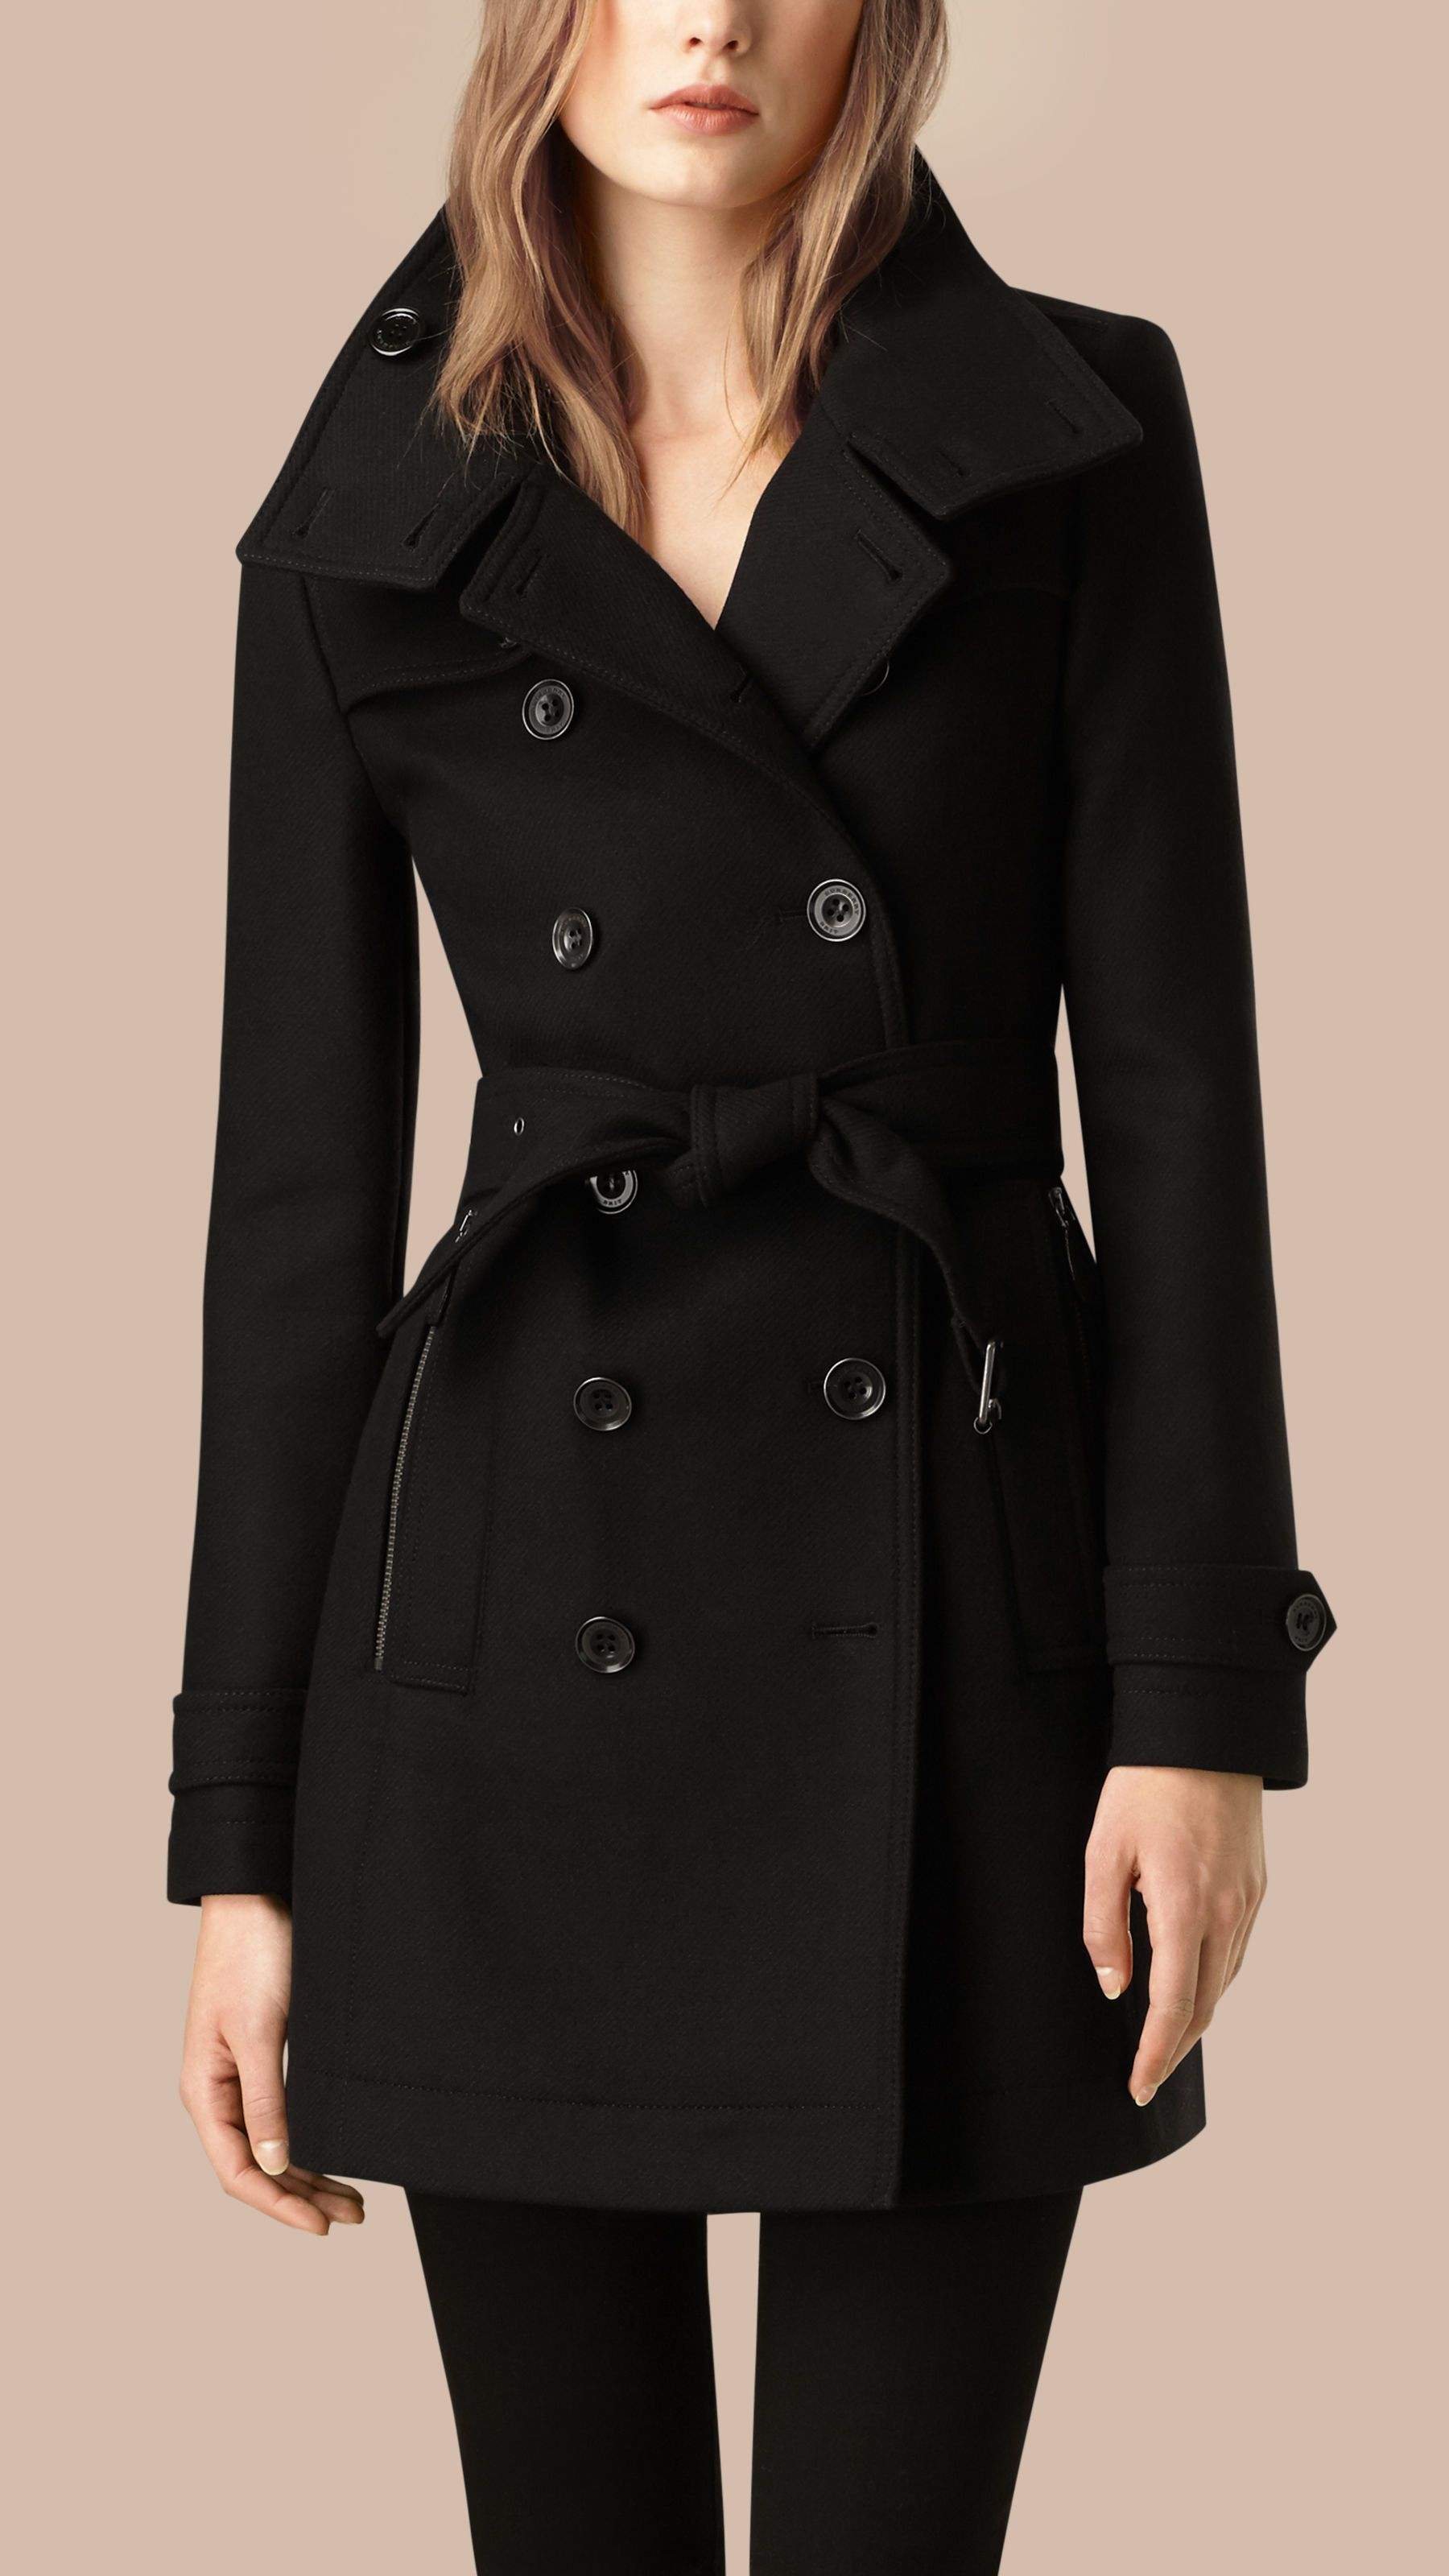 cf6a852b4 Women's Clothing in 2019 | Coats | Black dress coat, Burberry trench ...